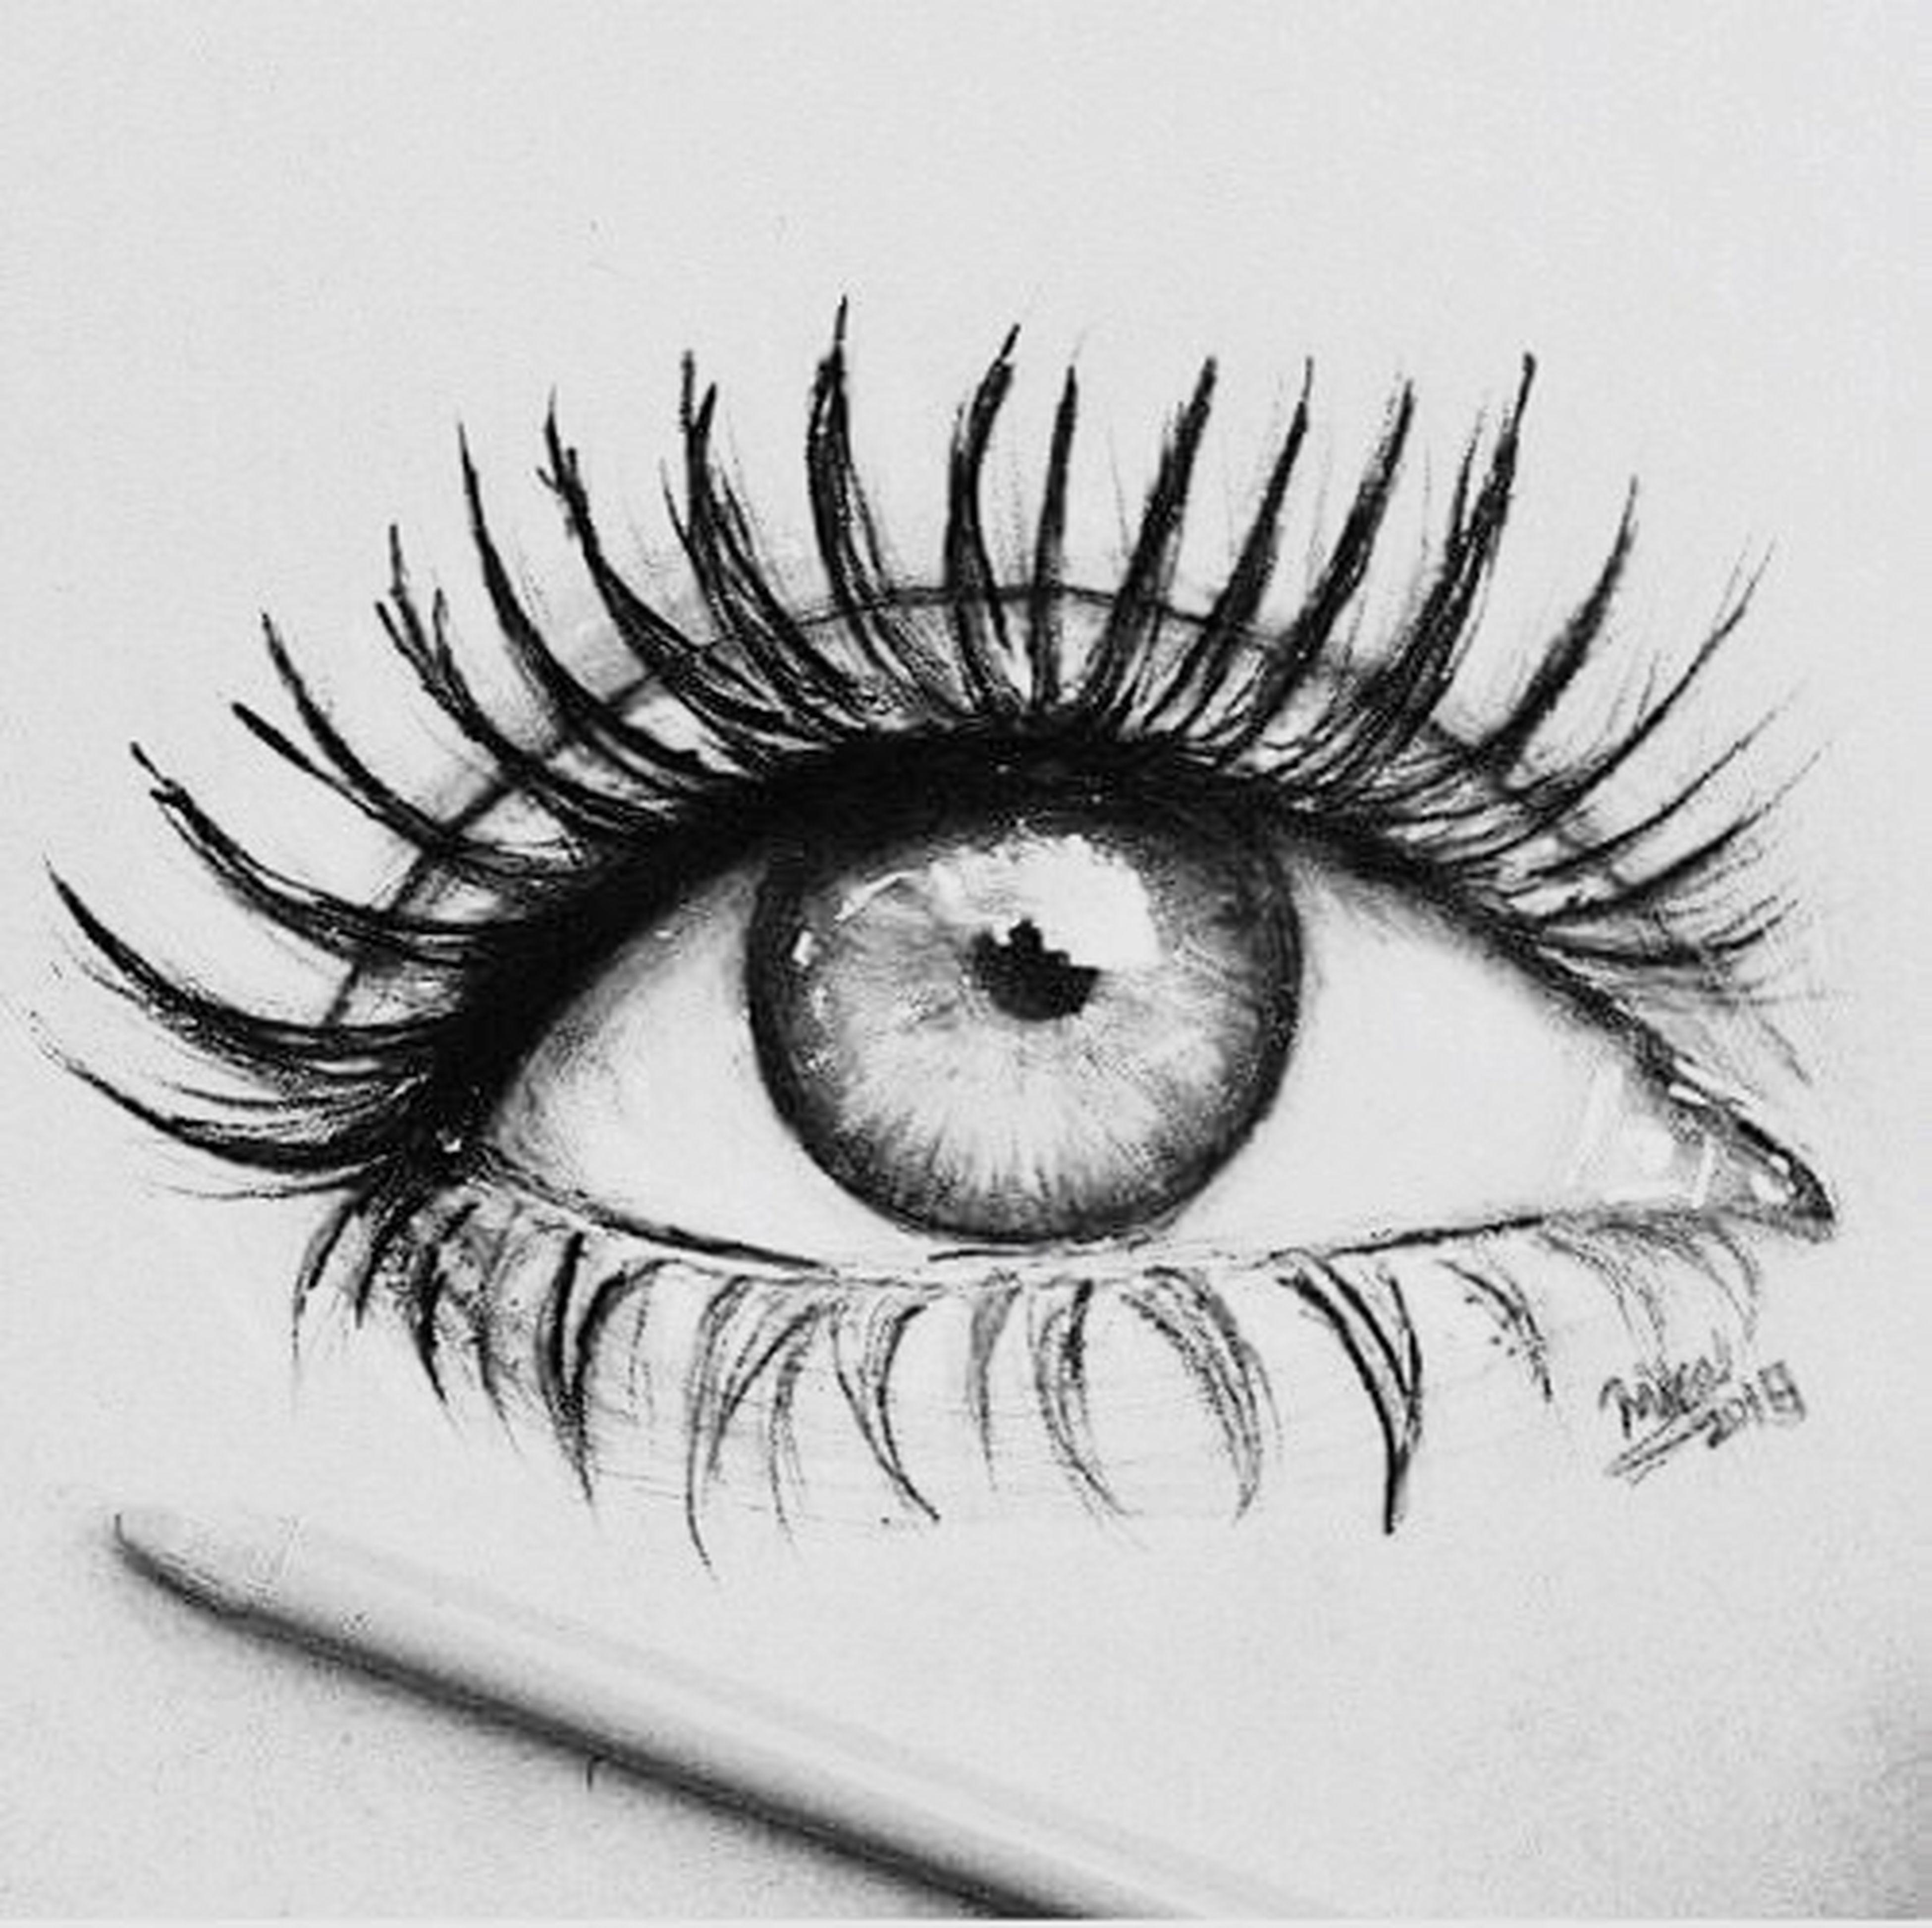 human eye, eyelash, extreme close-up, macro, human body part, iris - eye, close-up, sensory perception, eyeball, eye, eyeshadow, eyesight, beauty, one person, eyebrow, women, people, mascara, adults only, adult, day